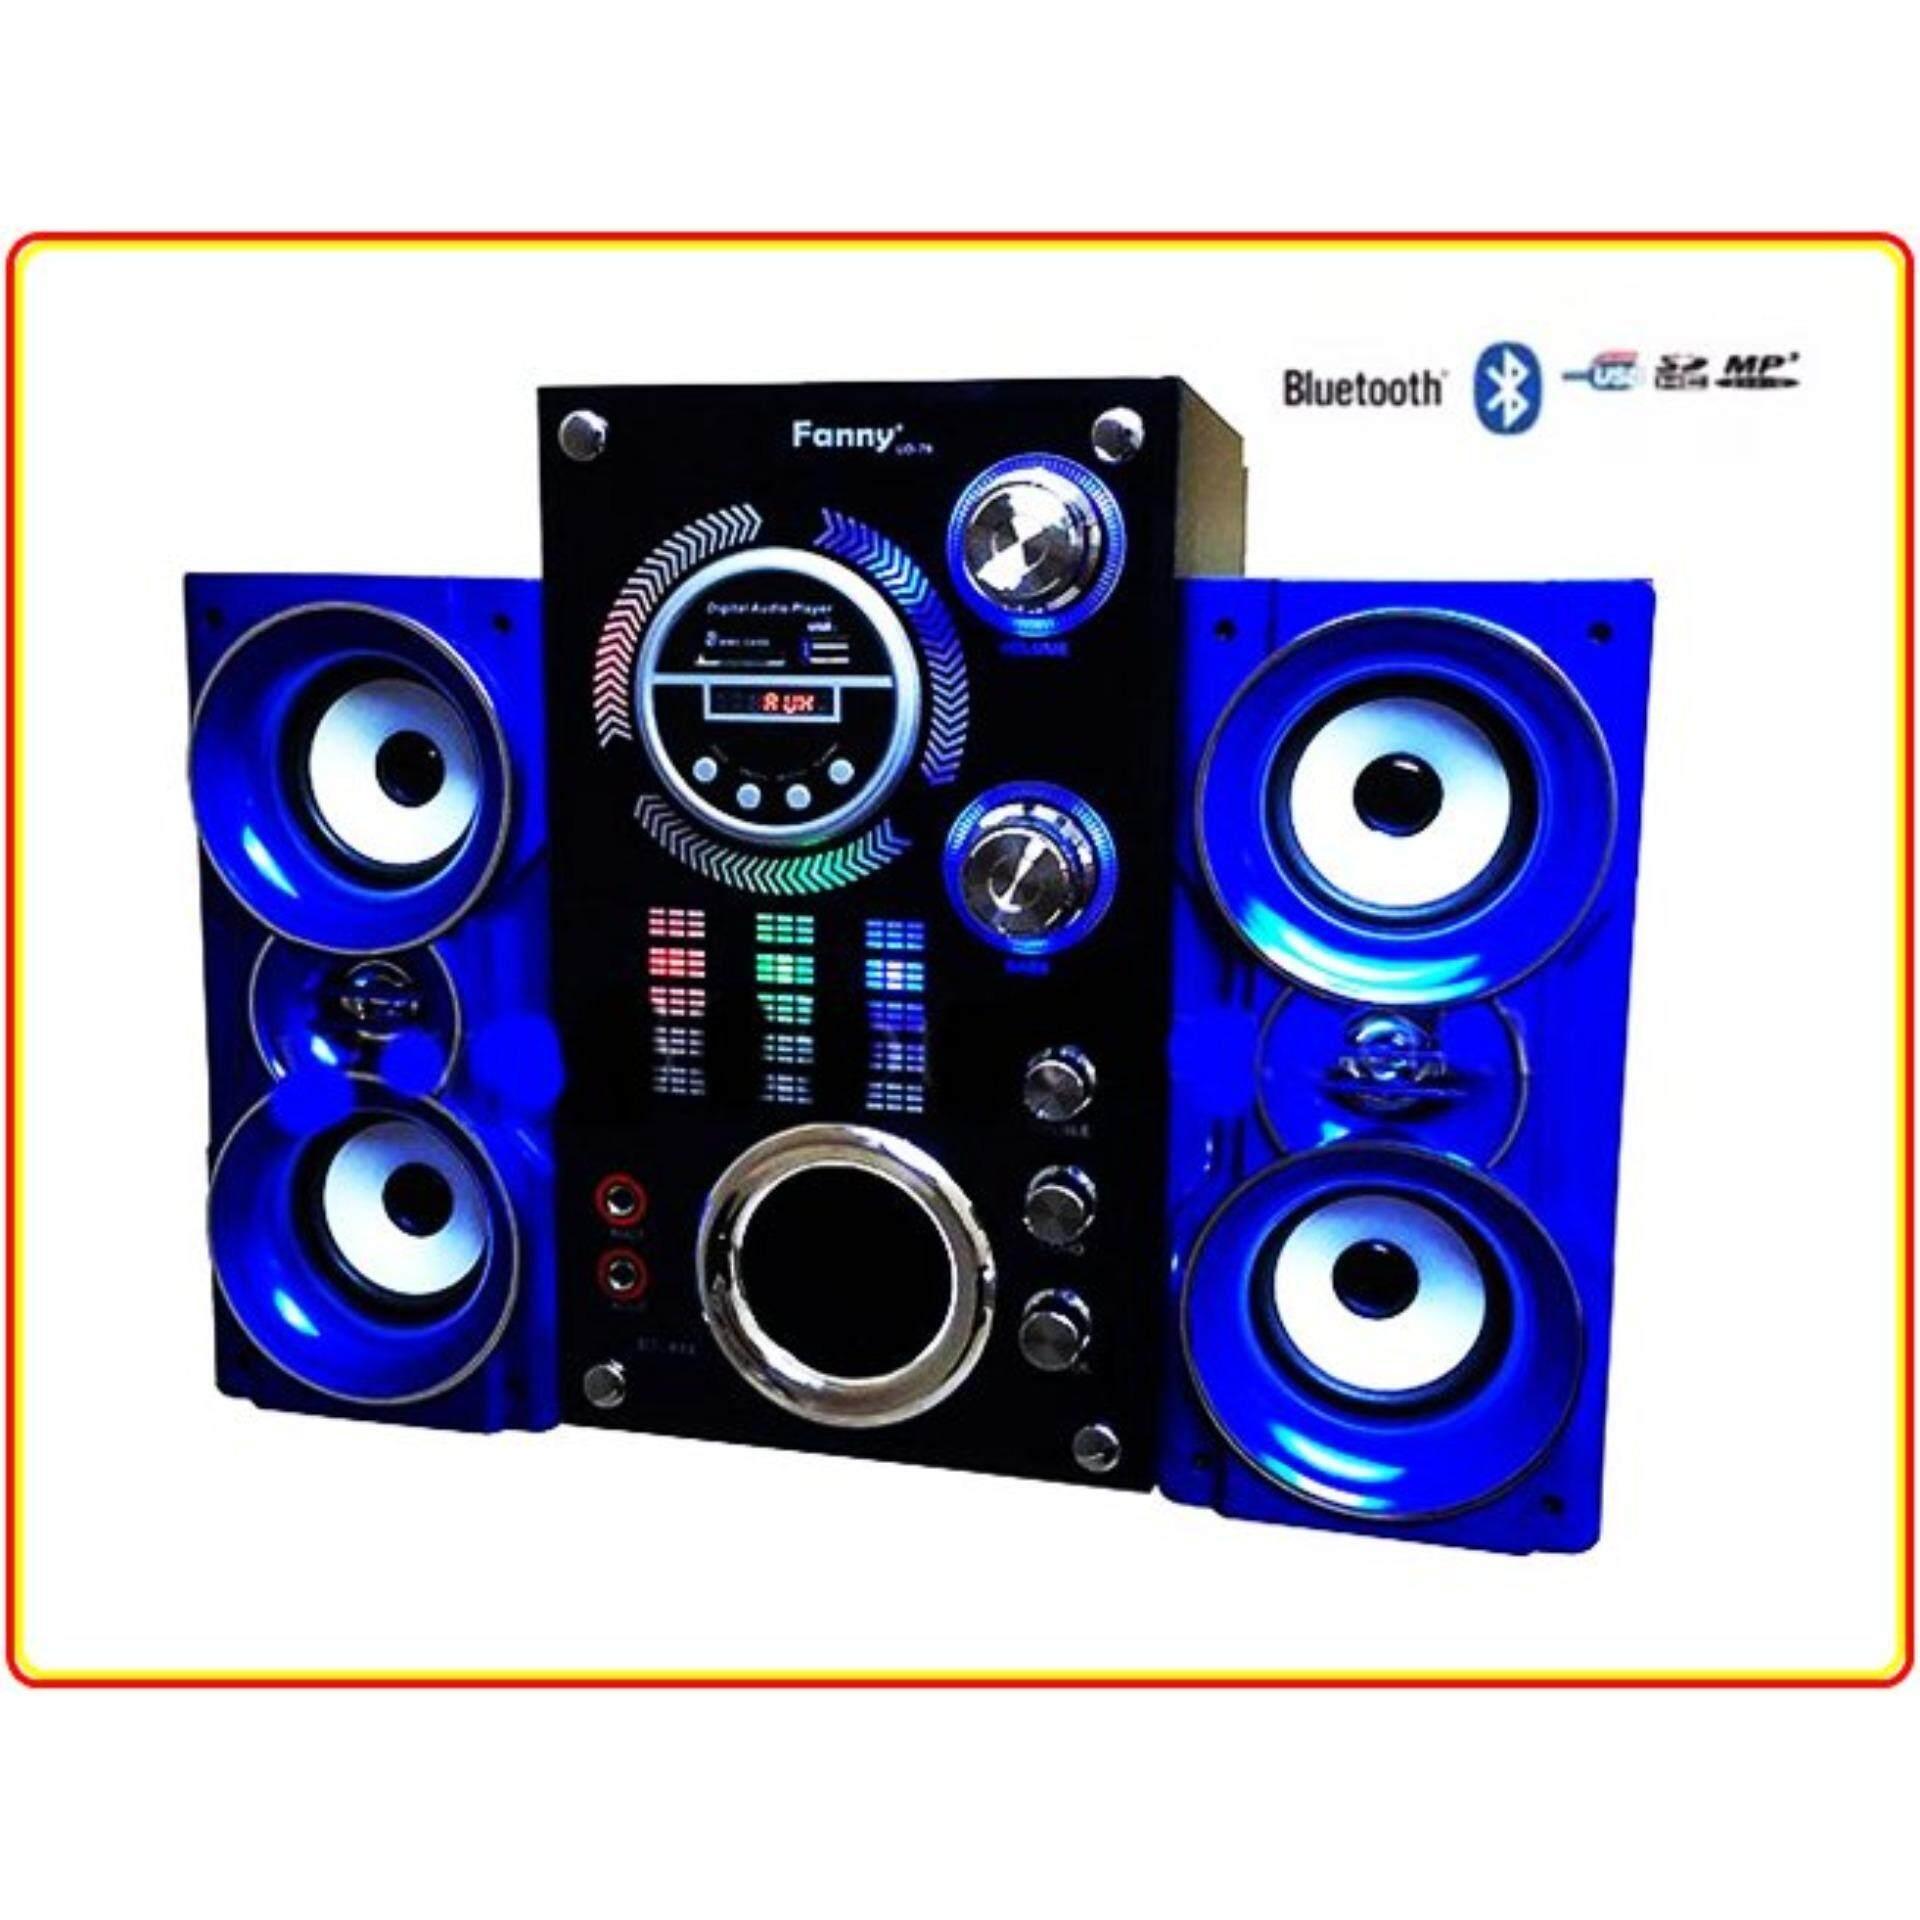 Fanny ลำโพงซับ Bluetooth 2.1 รุ่น BT-444 +FM,USB สีนำ้เงิน-ขาว